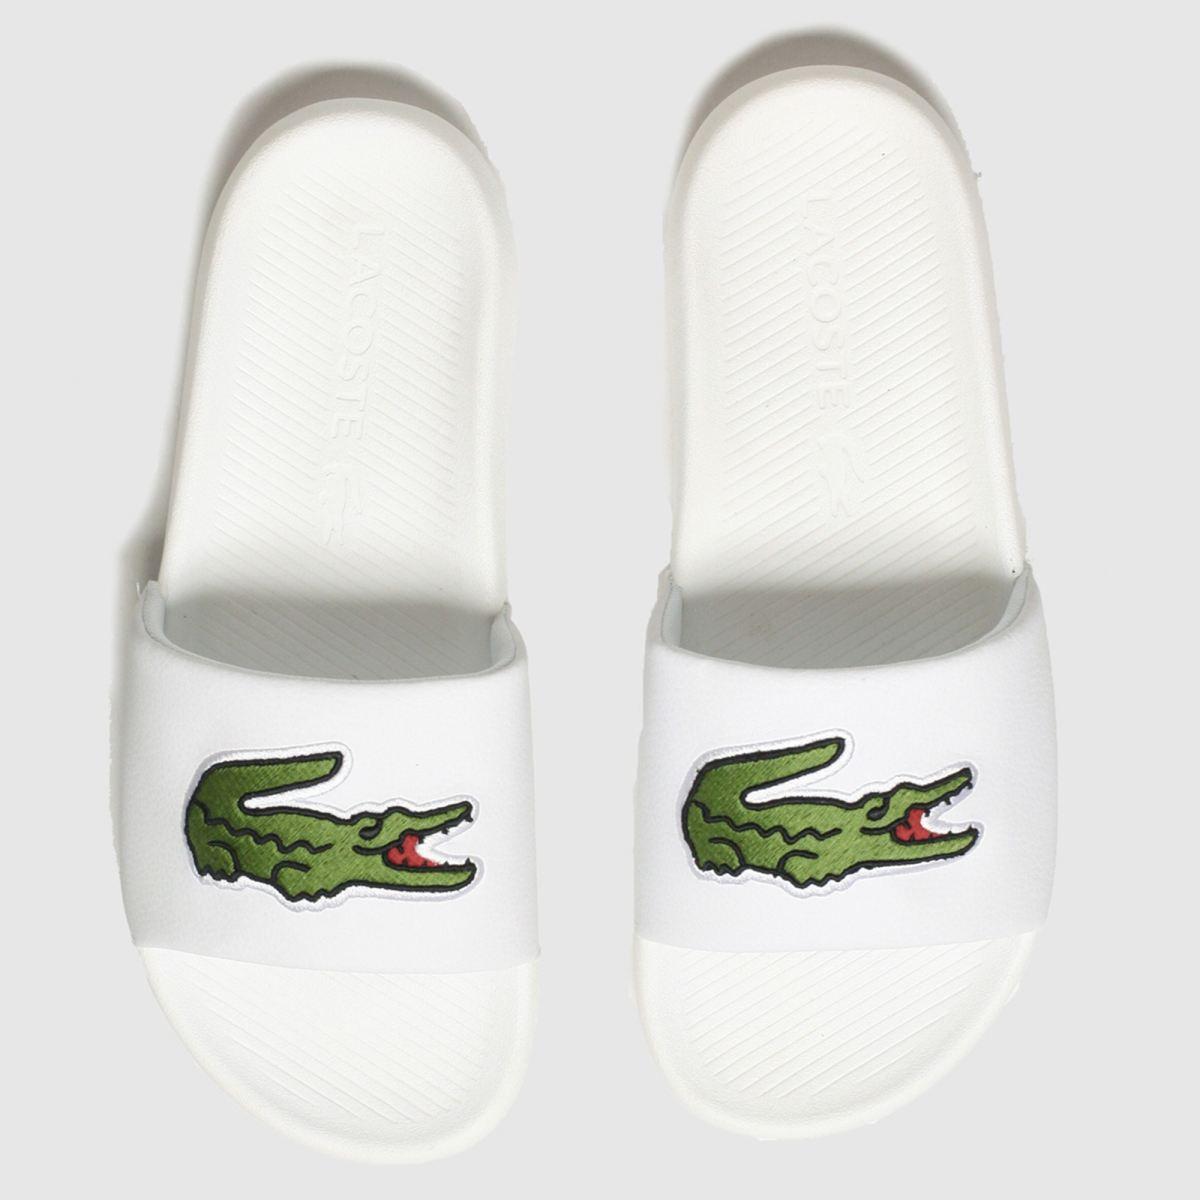 Lacoste White & Green Croco Slide Sandals